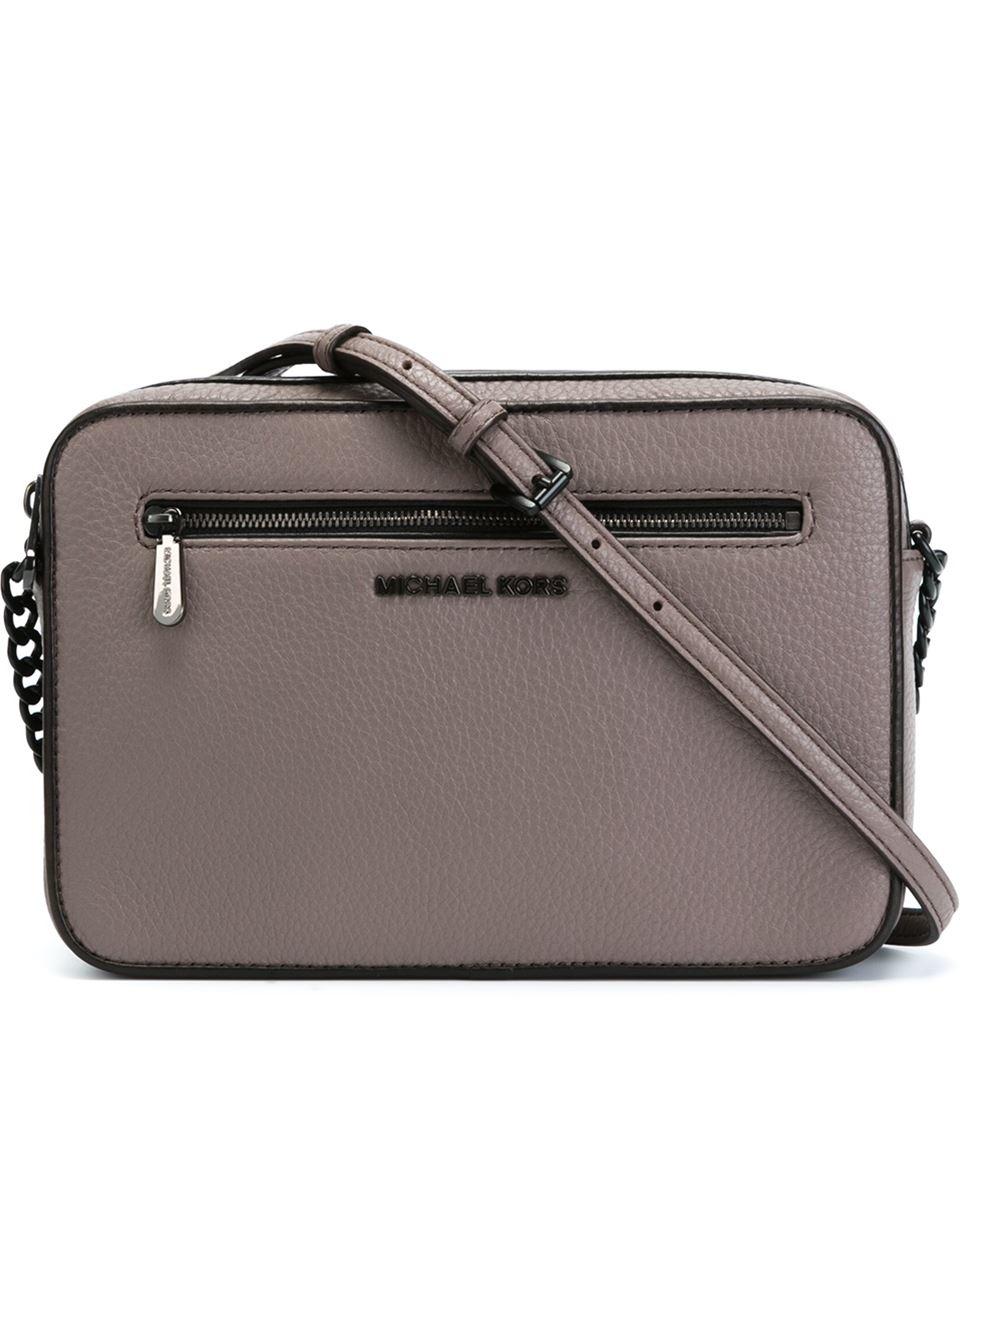 628b8b07d316 MICHAEL Michael Kors Jet Set Travel Leather Cross-Body Bag in Gray ...